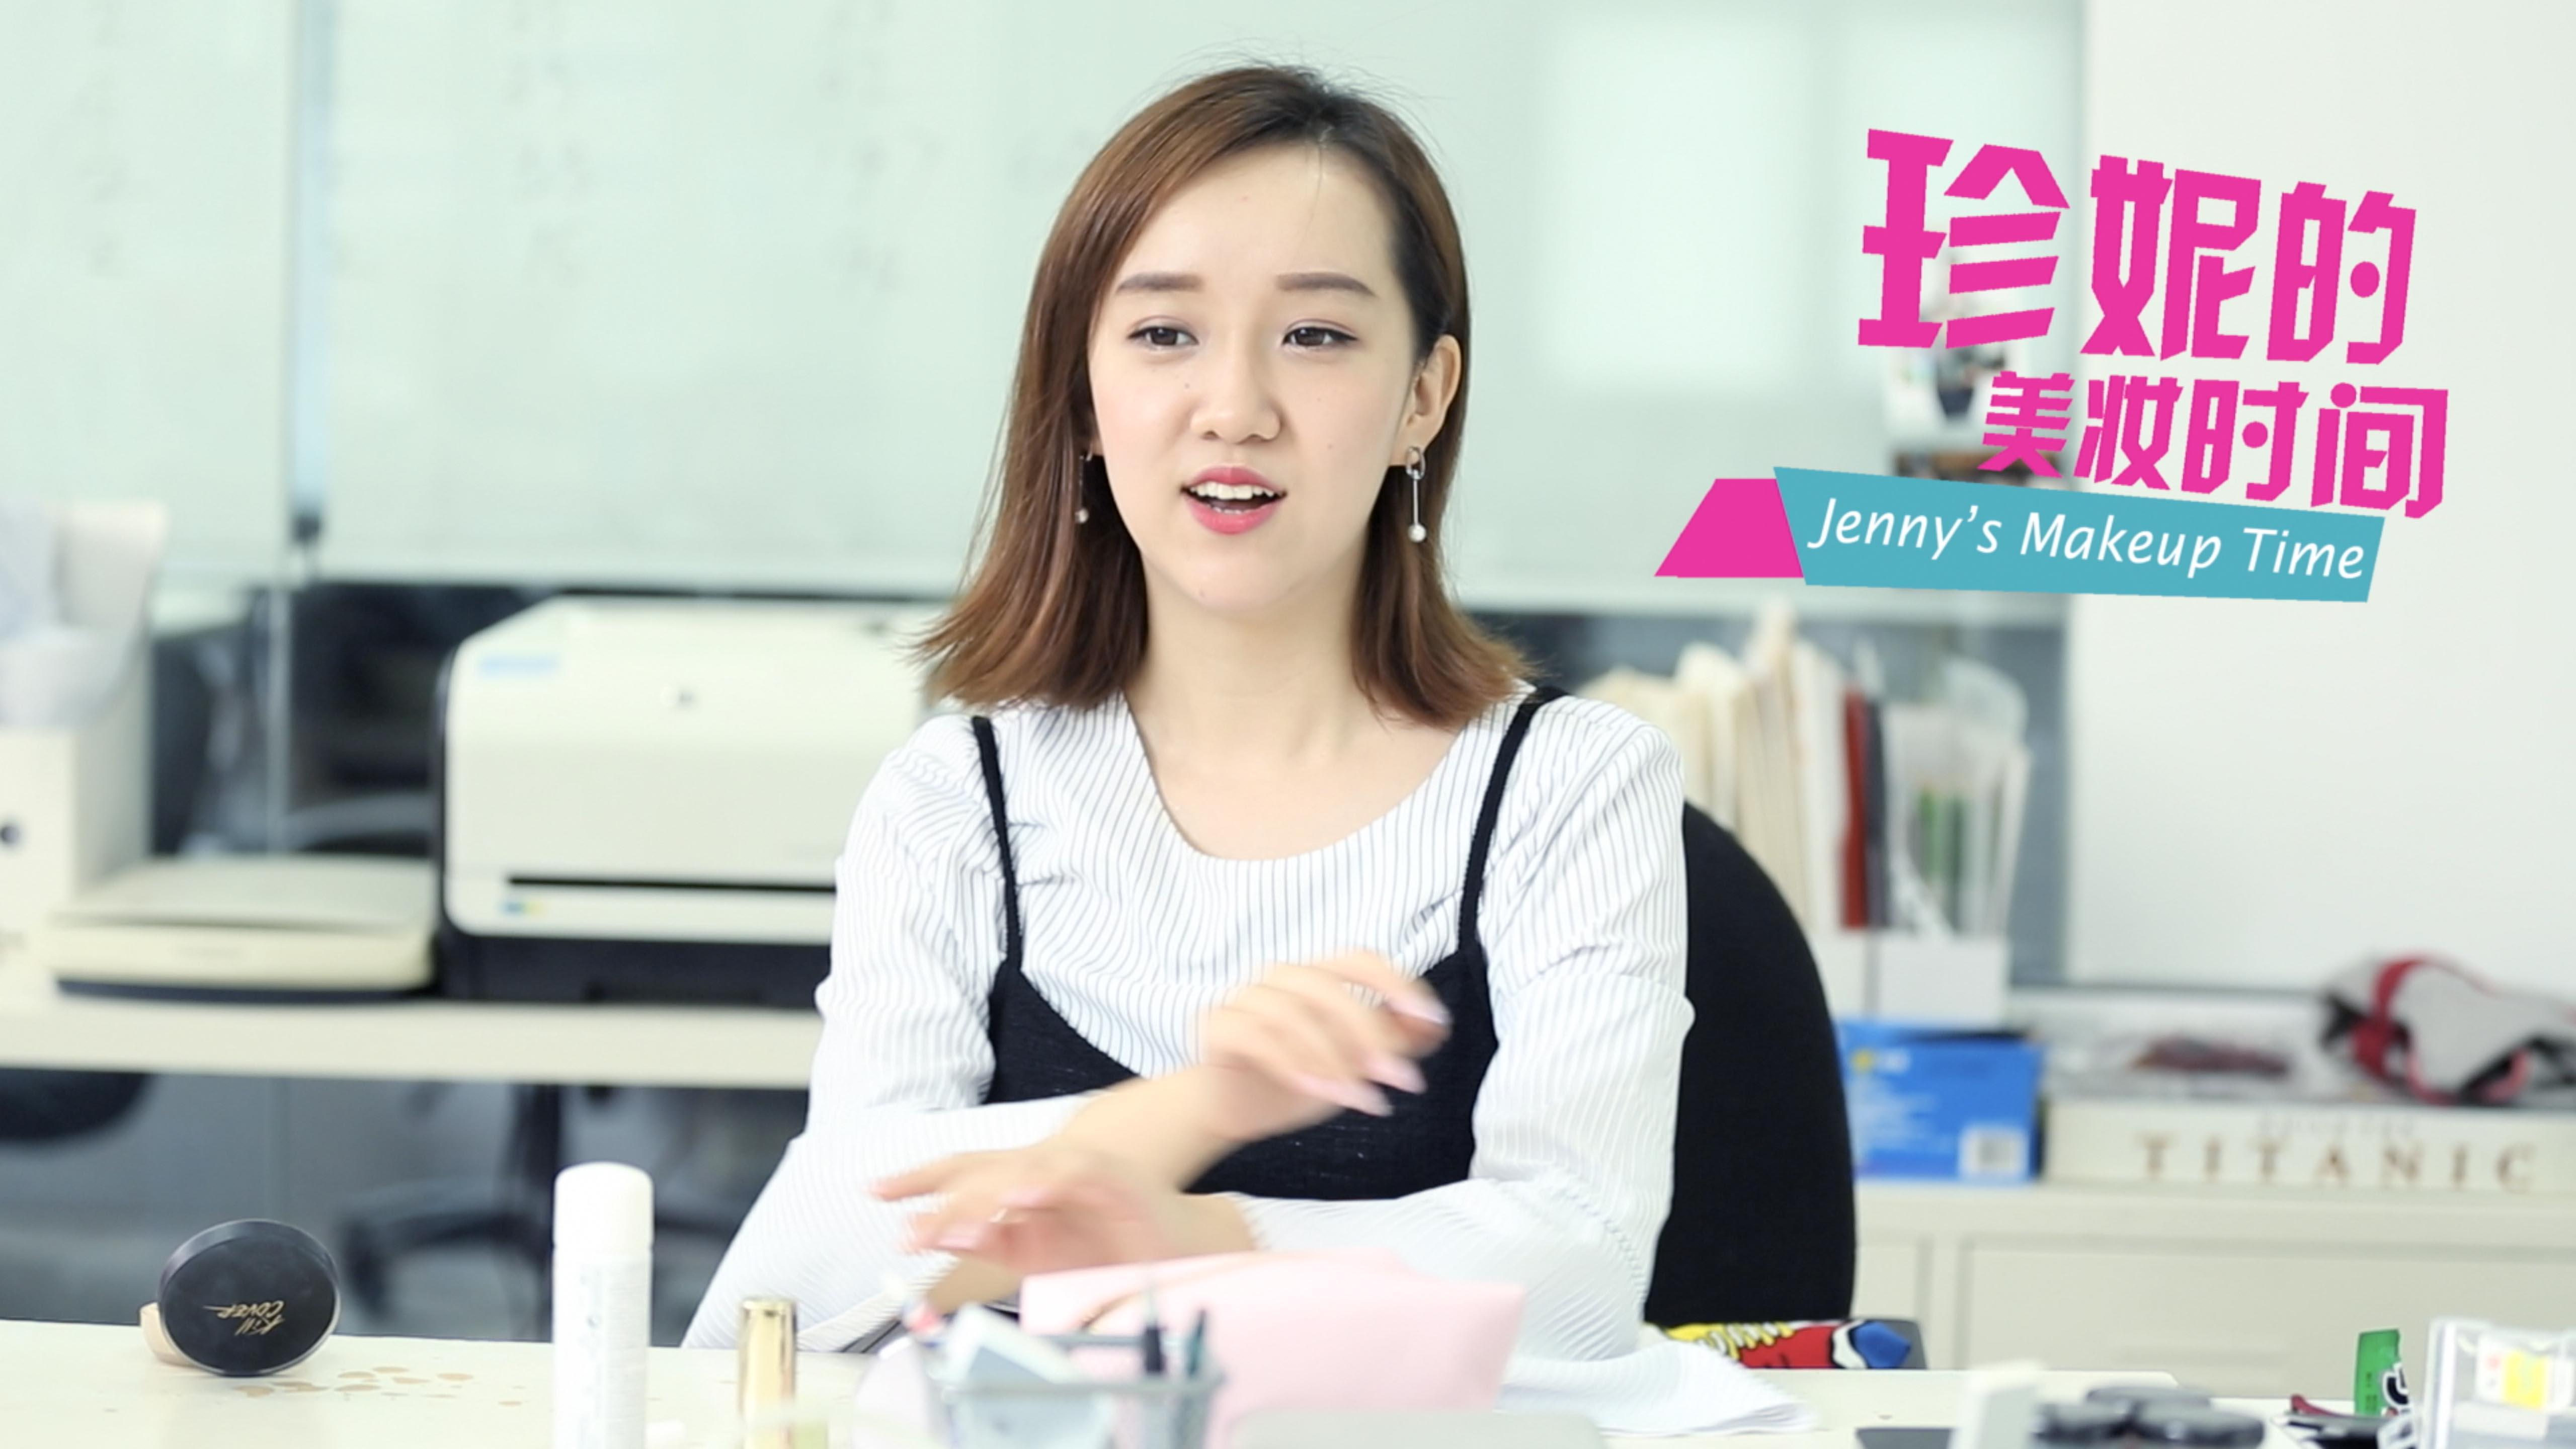 jenny makeover